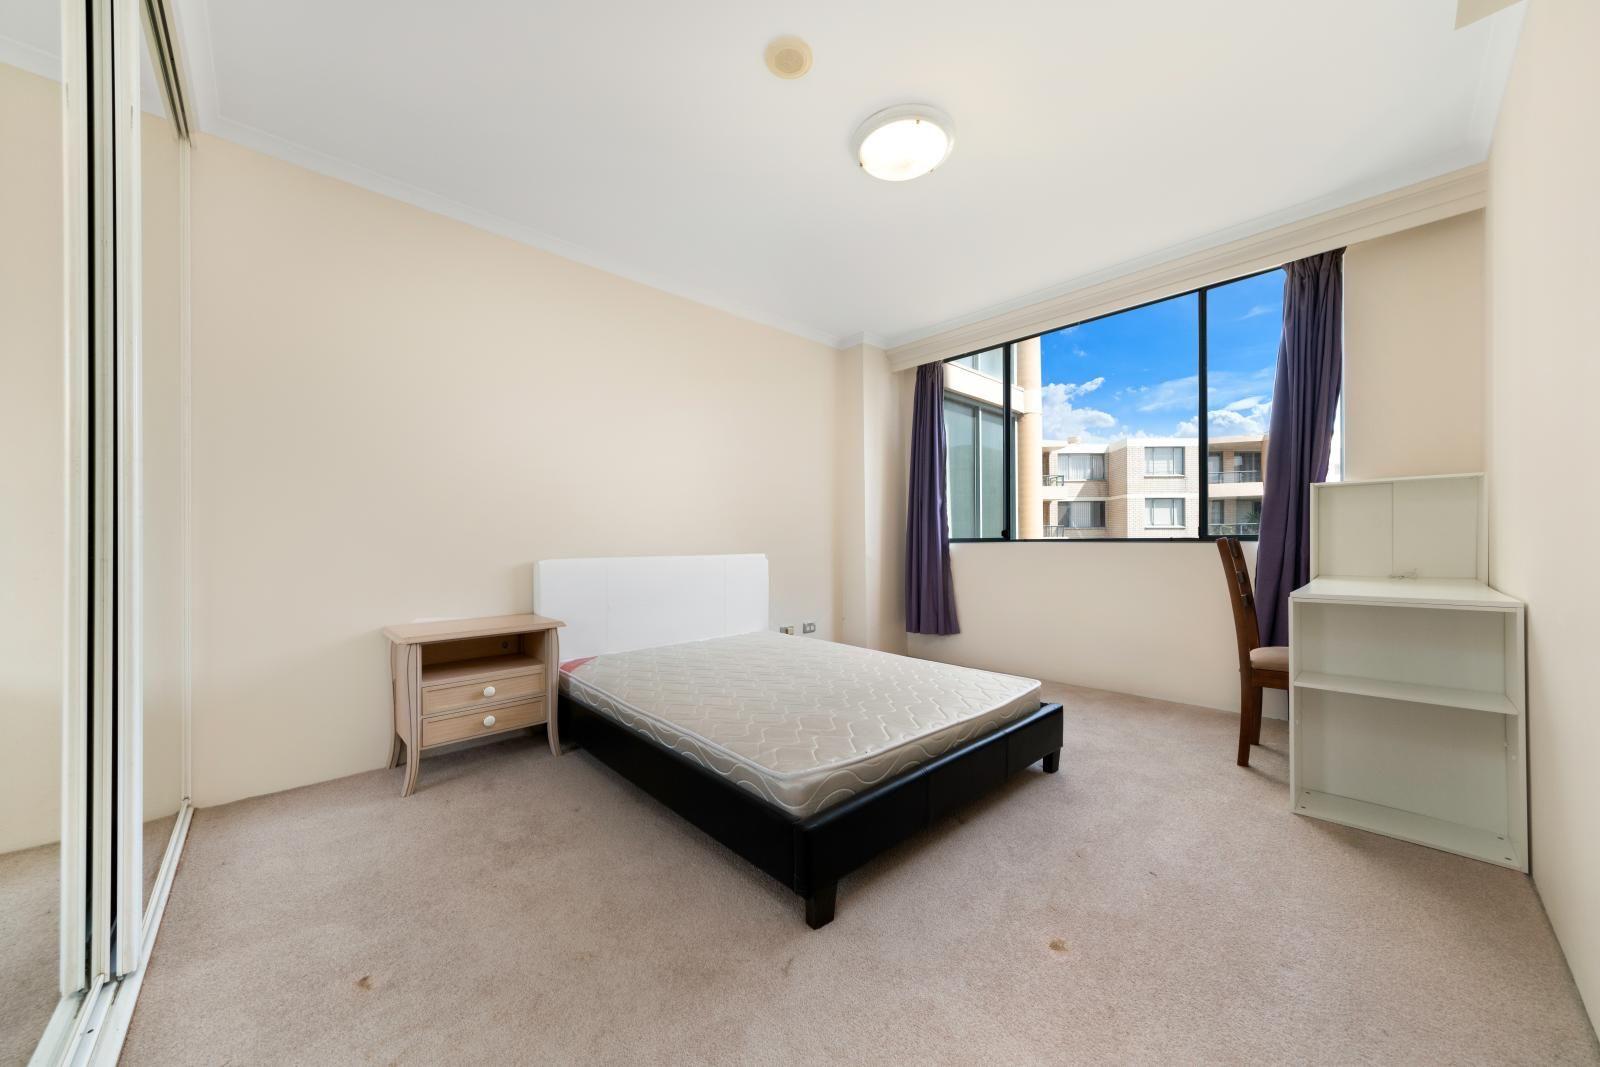 unit148/132 Maroubra Rd, Maroubra NSW 2035, Image 2